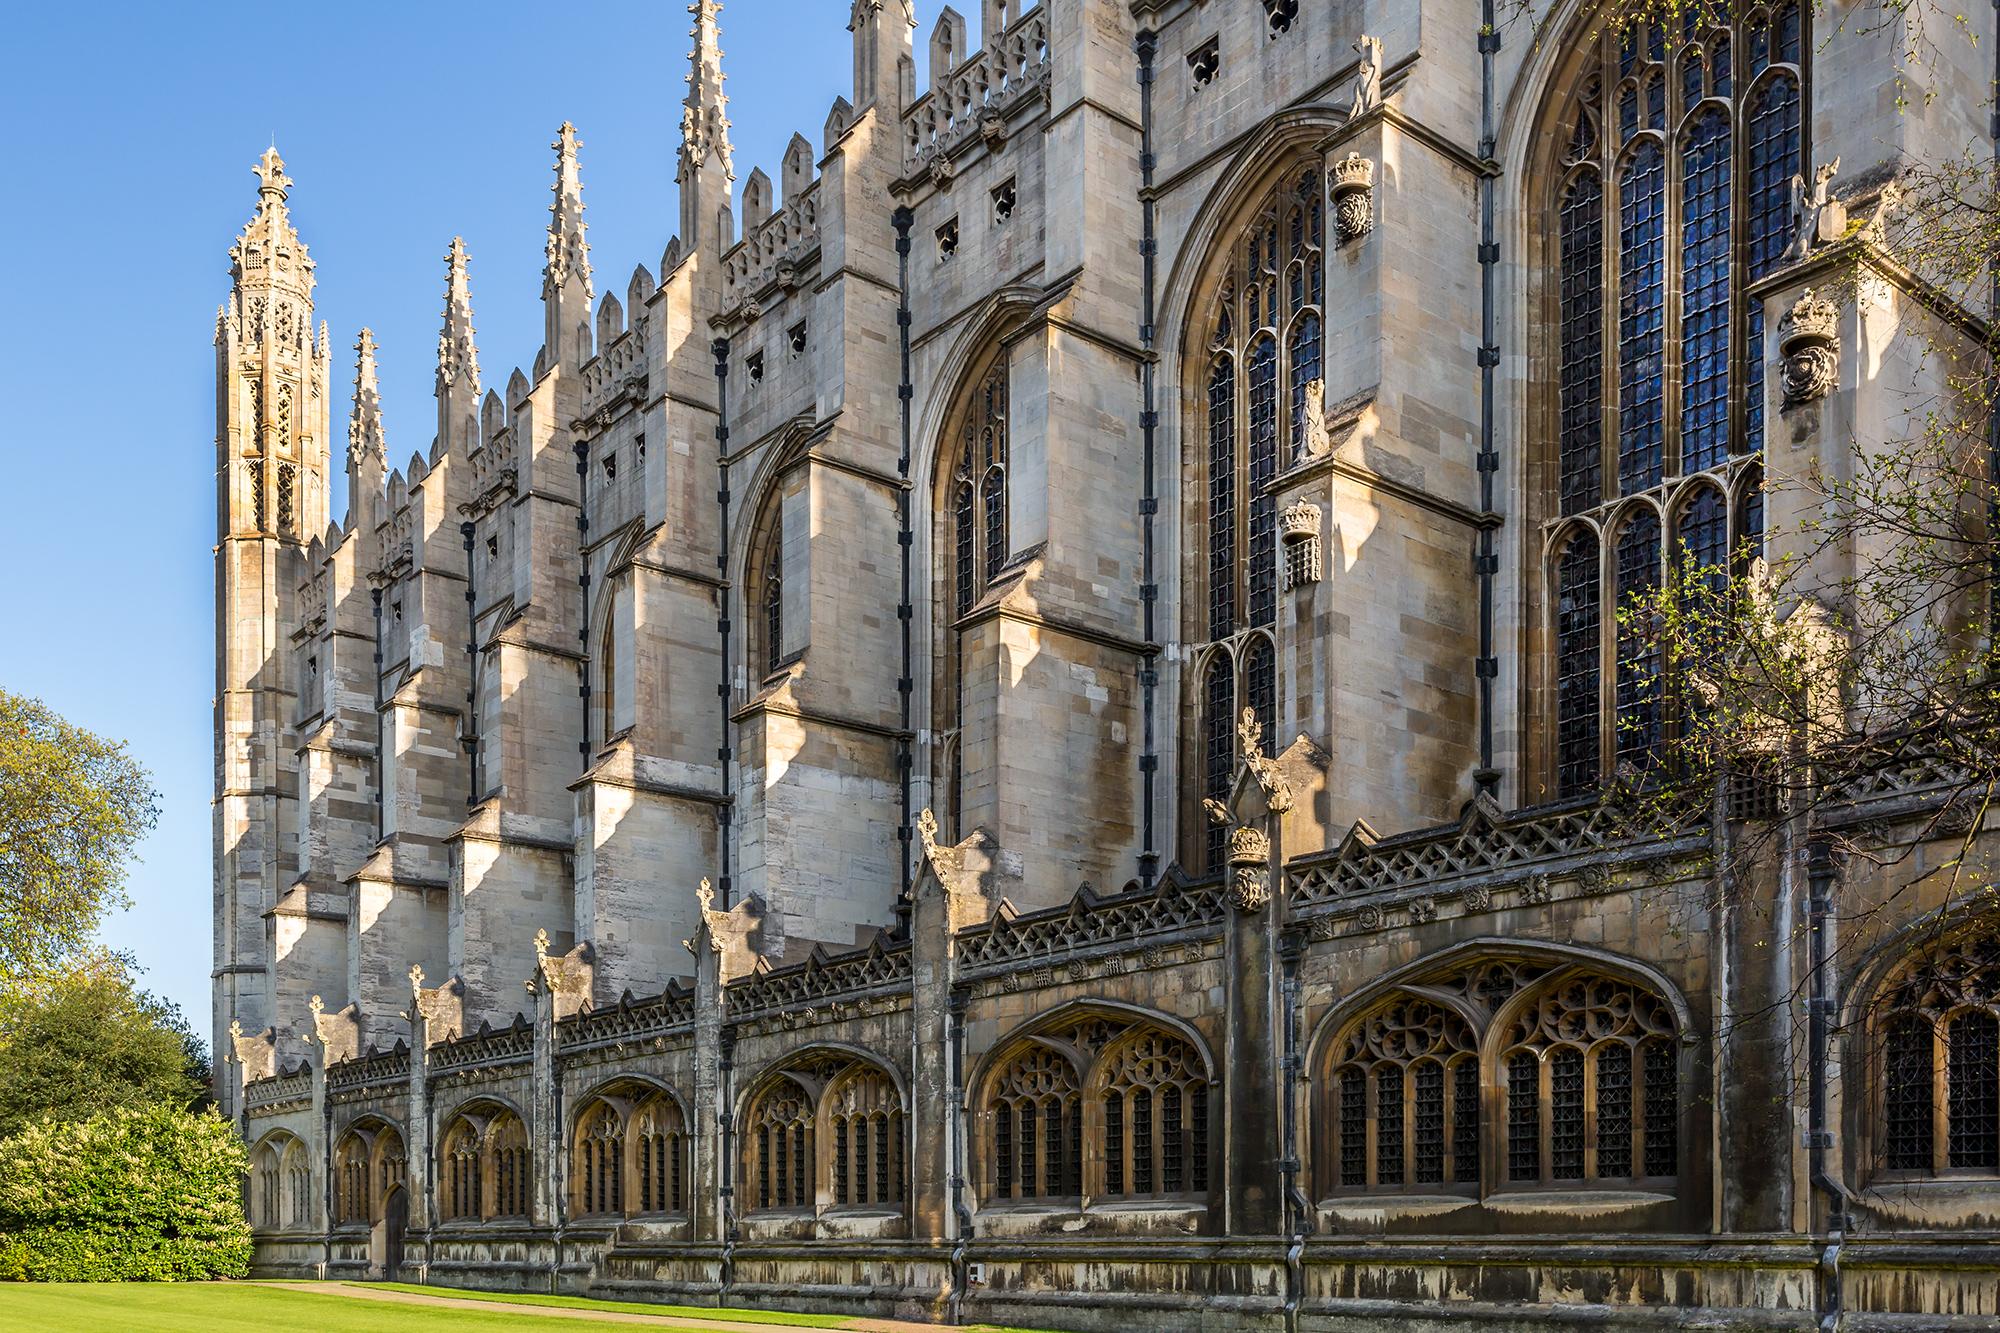 Kings College Chapel, Cambridge